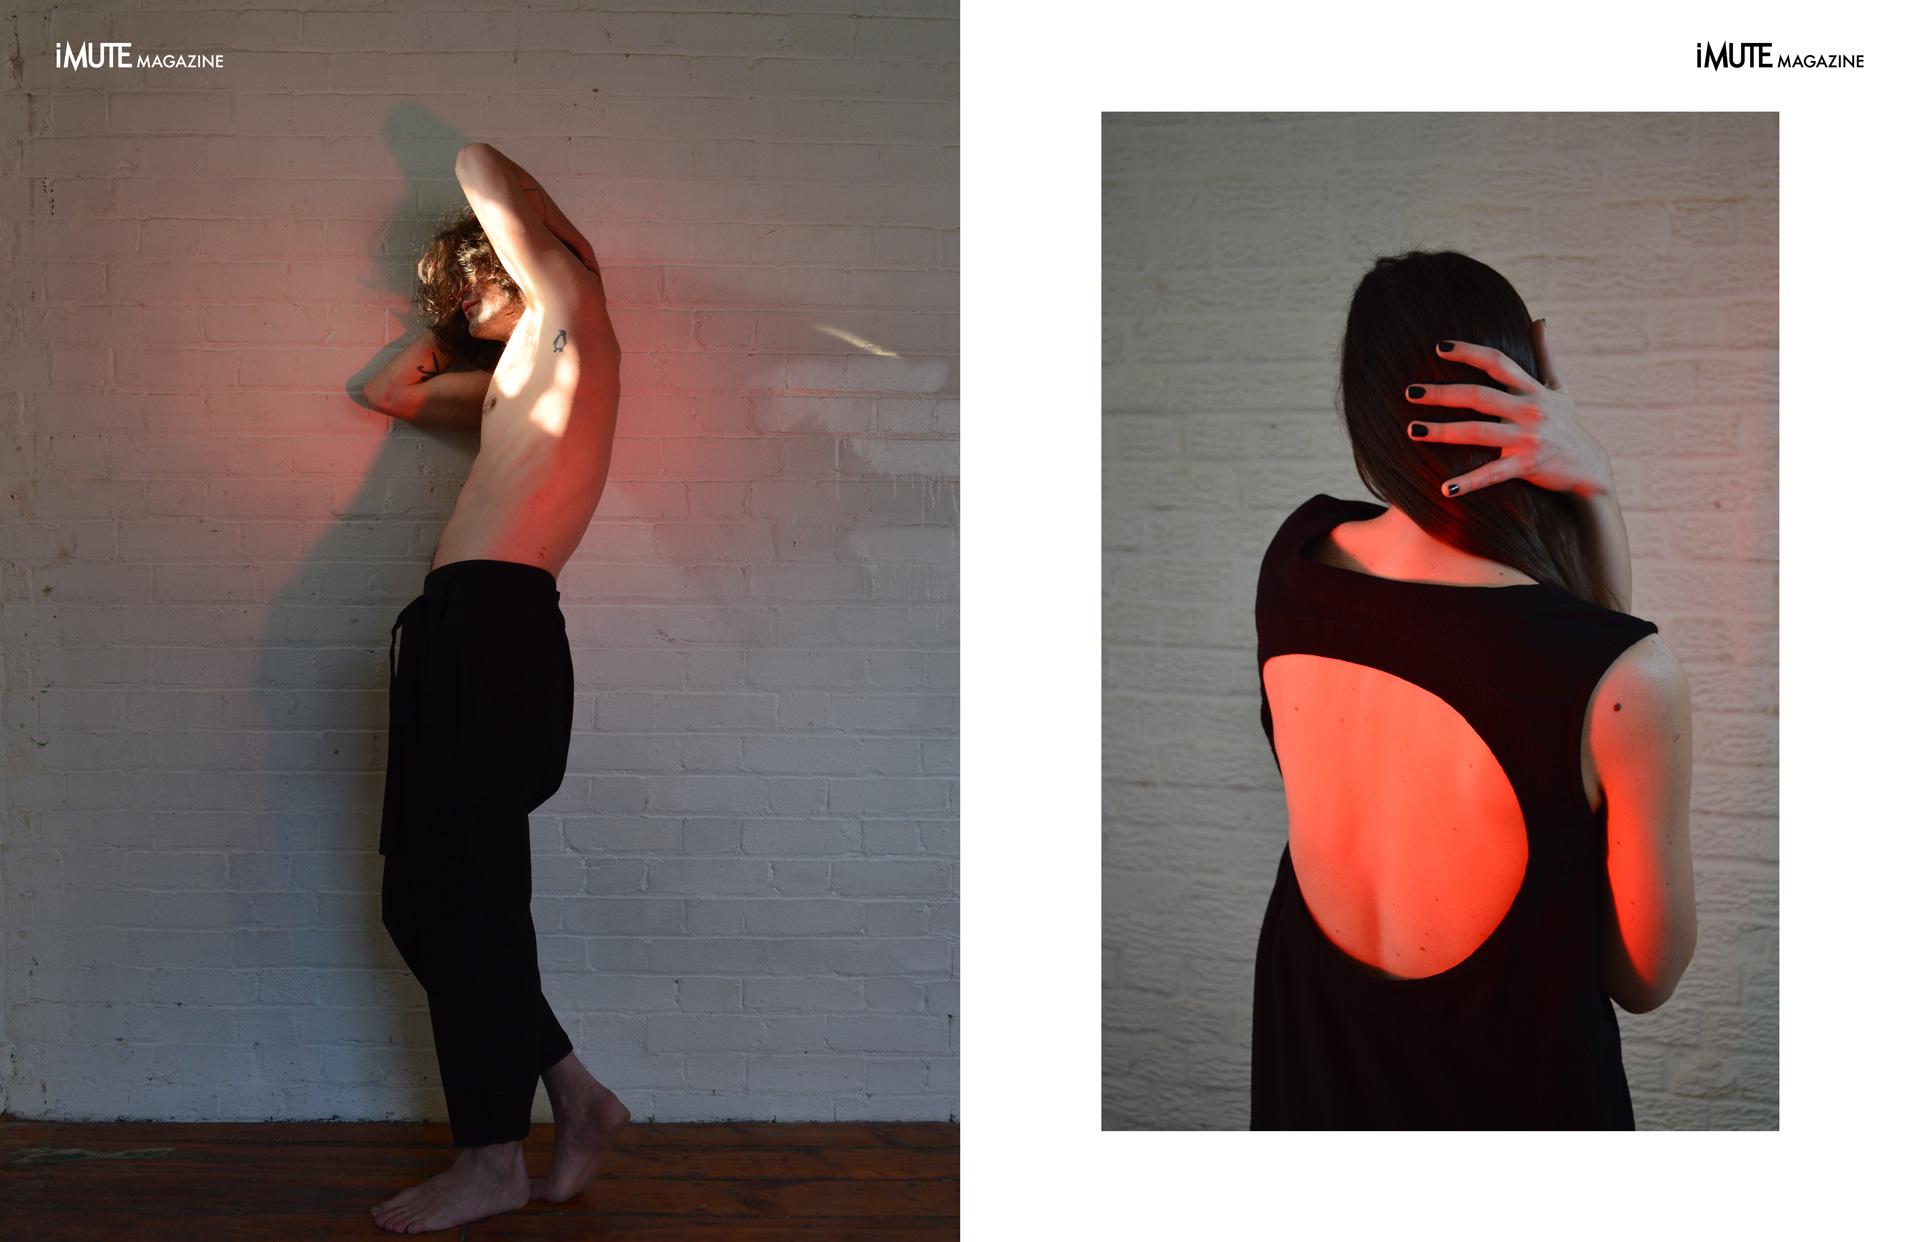 Deep End advertorial for iMute Magazine Clothes | Clon8 Photographer & Creative Director | Kostis Fokas Models | Scott Temple @ Premier Model Management & Nikoleta Michalodimitraki Stylist | Angelika Chilikova